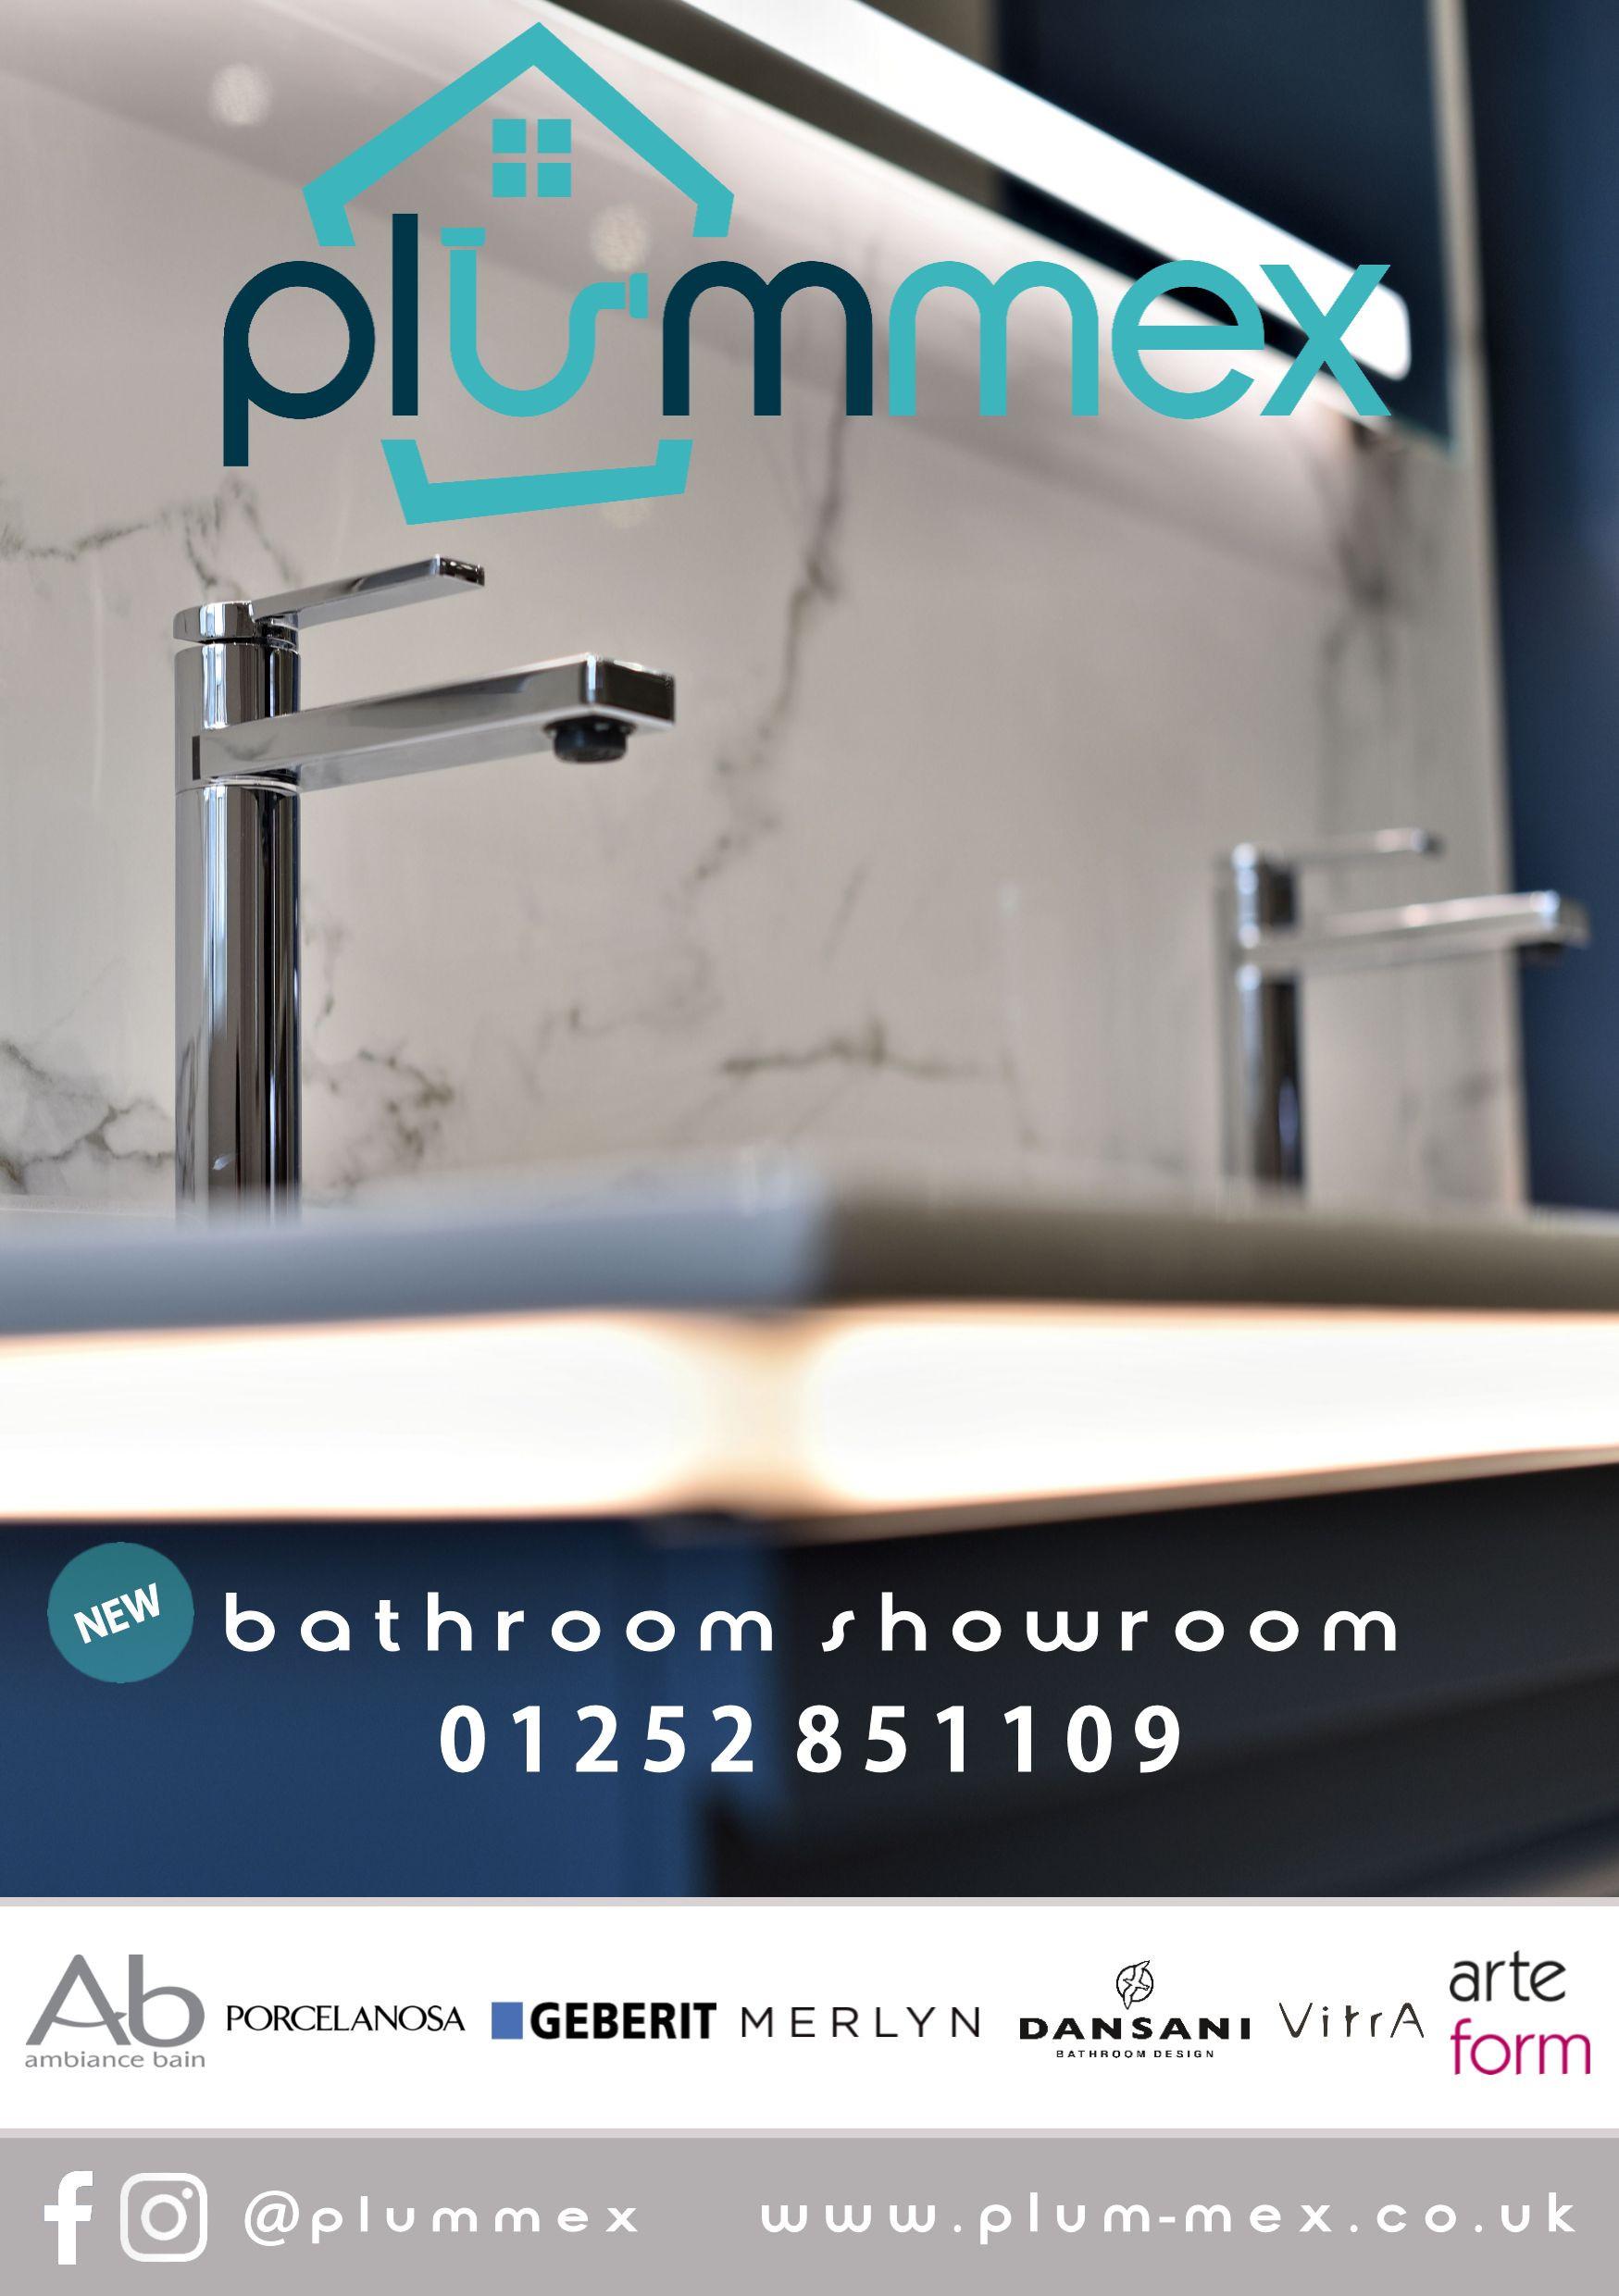 Plum-mex bathroom showroom